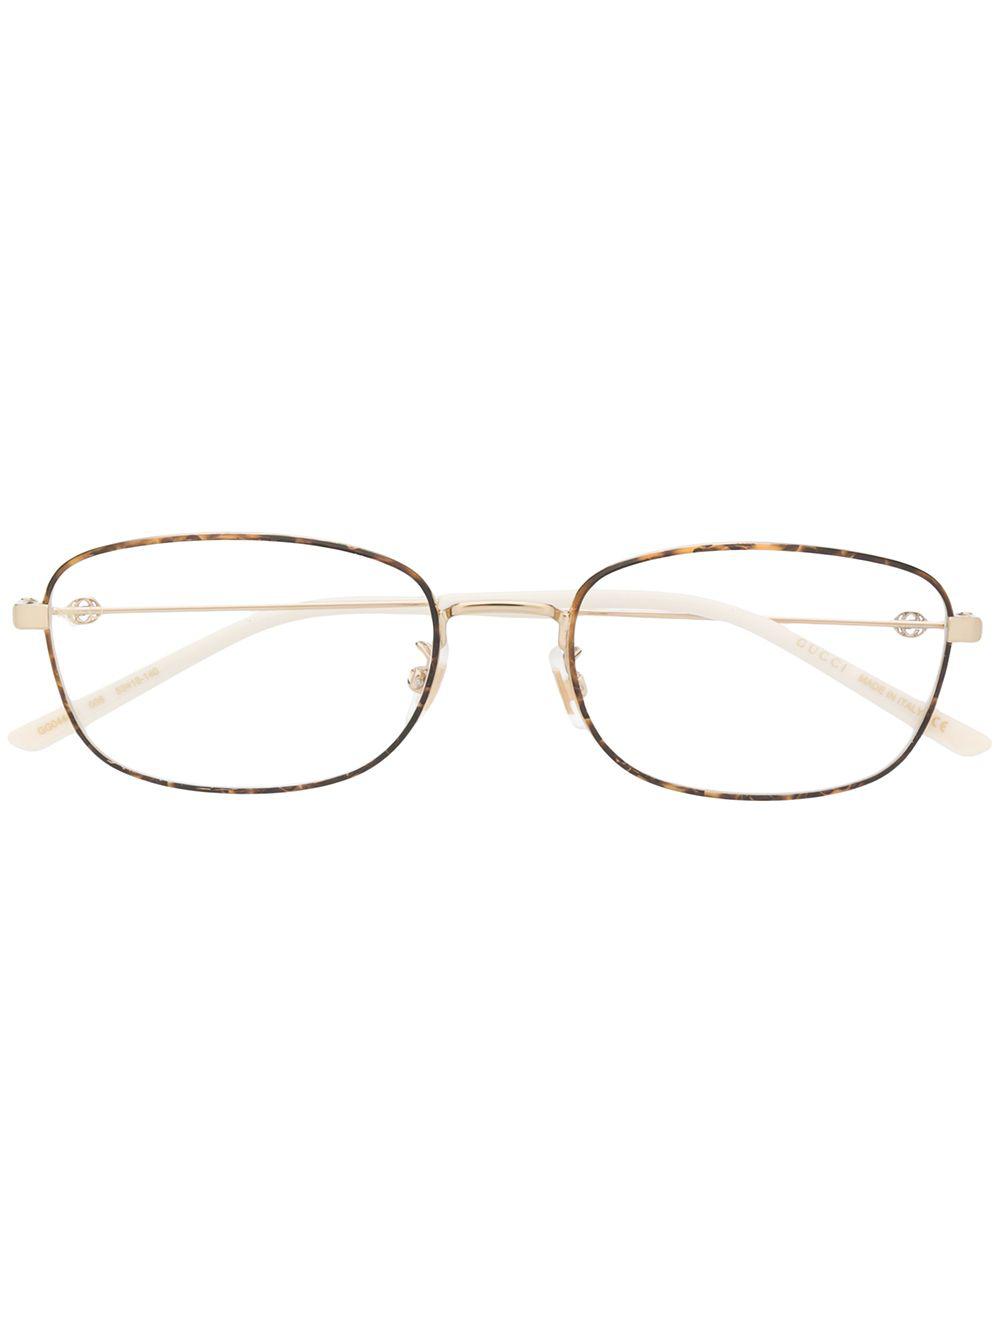 f39d9193d4f2f Gucci Eyewear Thin Tortoiseshell Square Frame Glasses - Gold